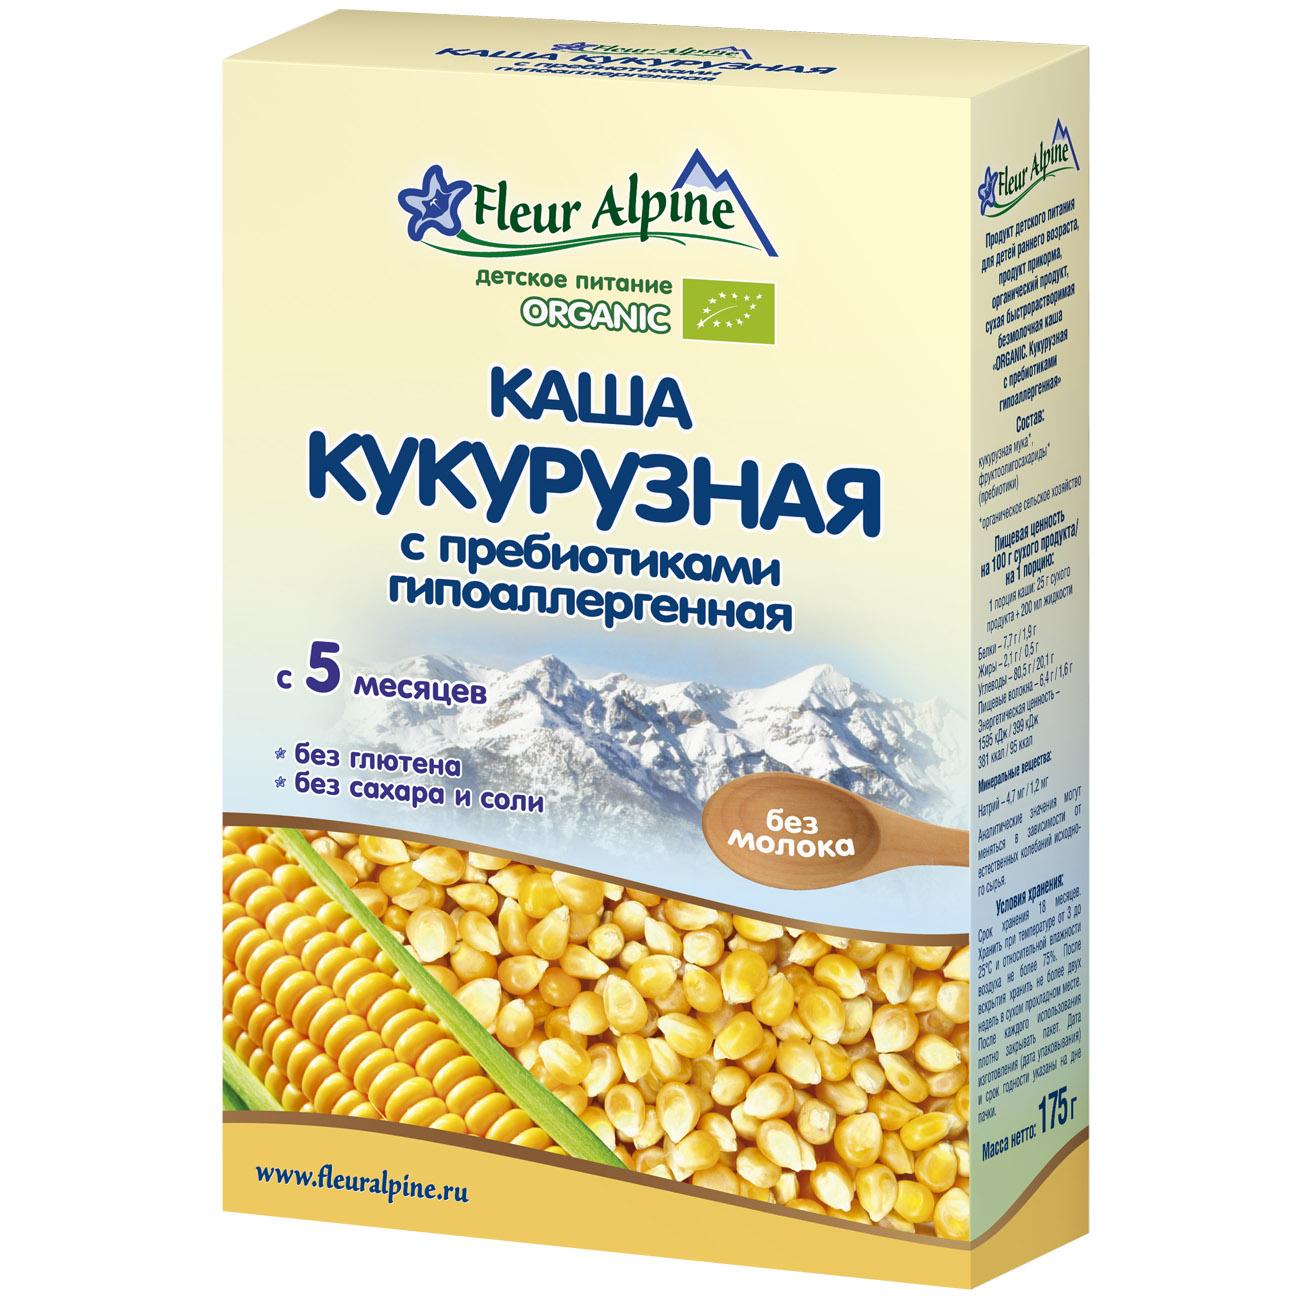 Каша Fleur Alpine Органик безмолочная 175 гр Кукурузная с пребиотиками (с 5 мес)<br>